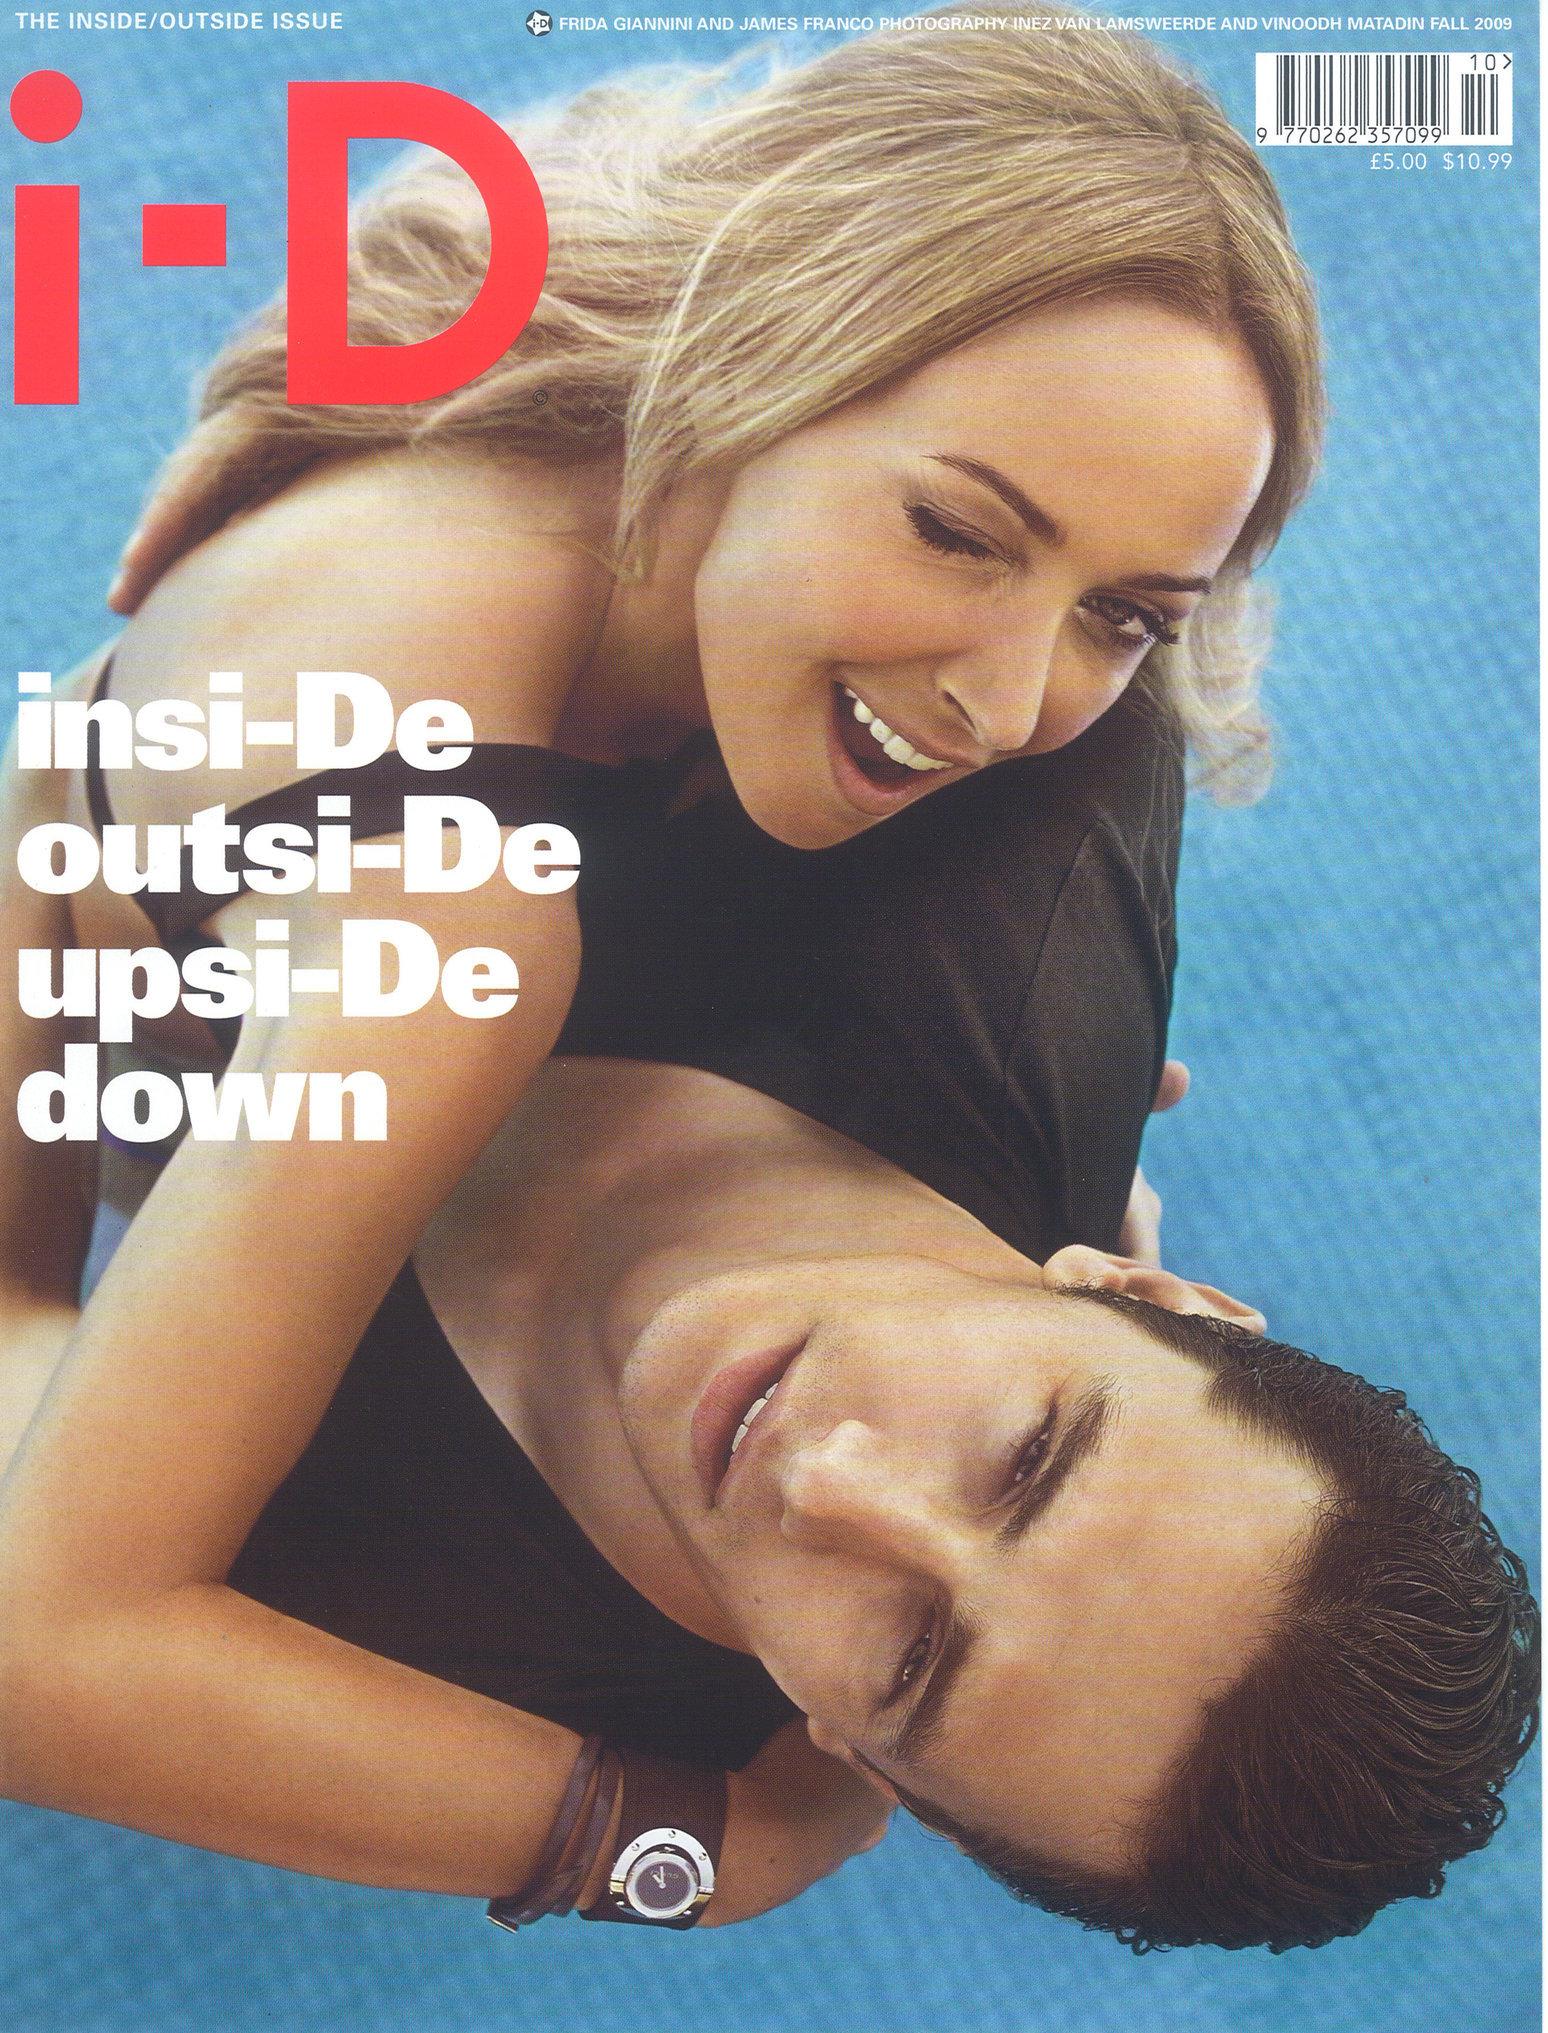 I-D Magazine, Fall 2009, #303, Cover.jpg